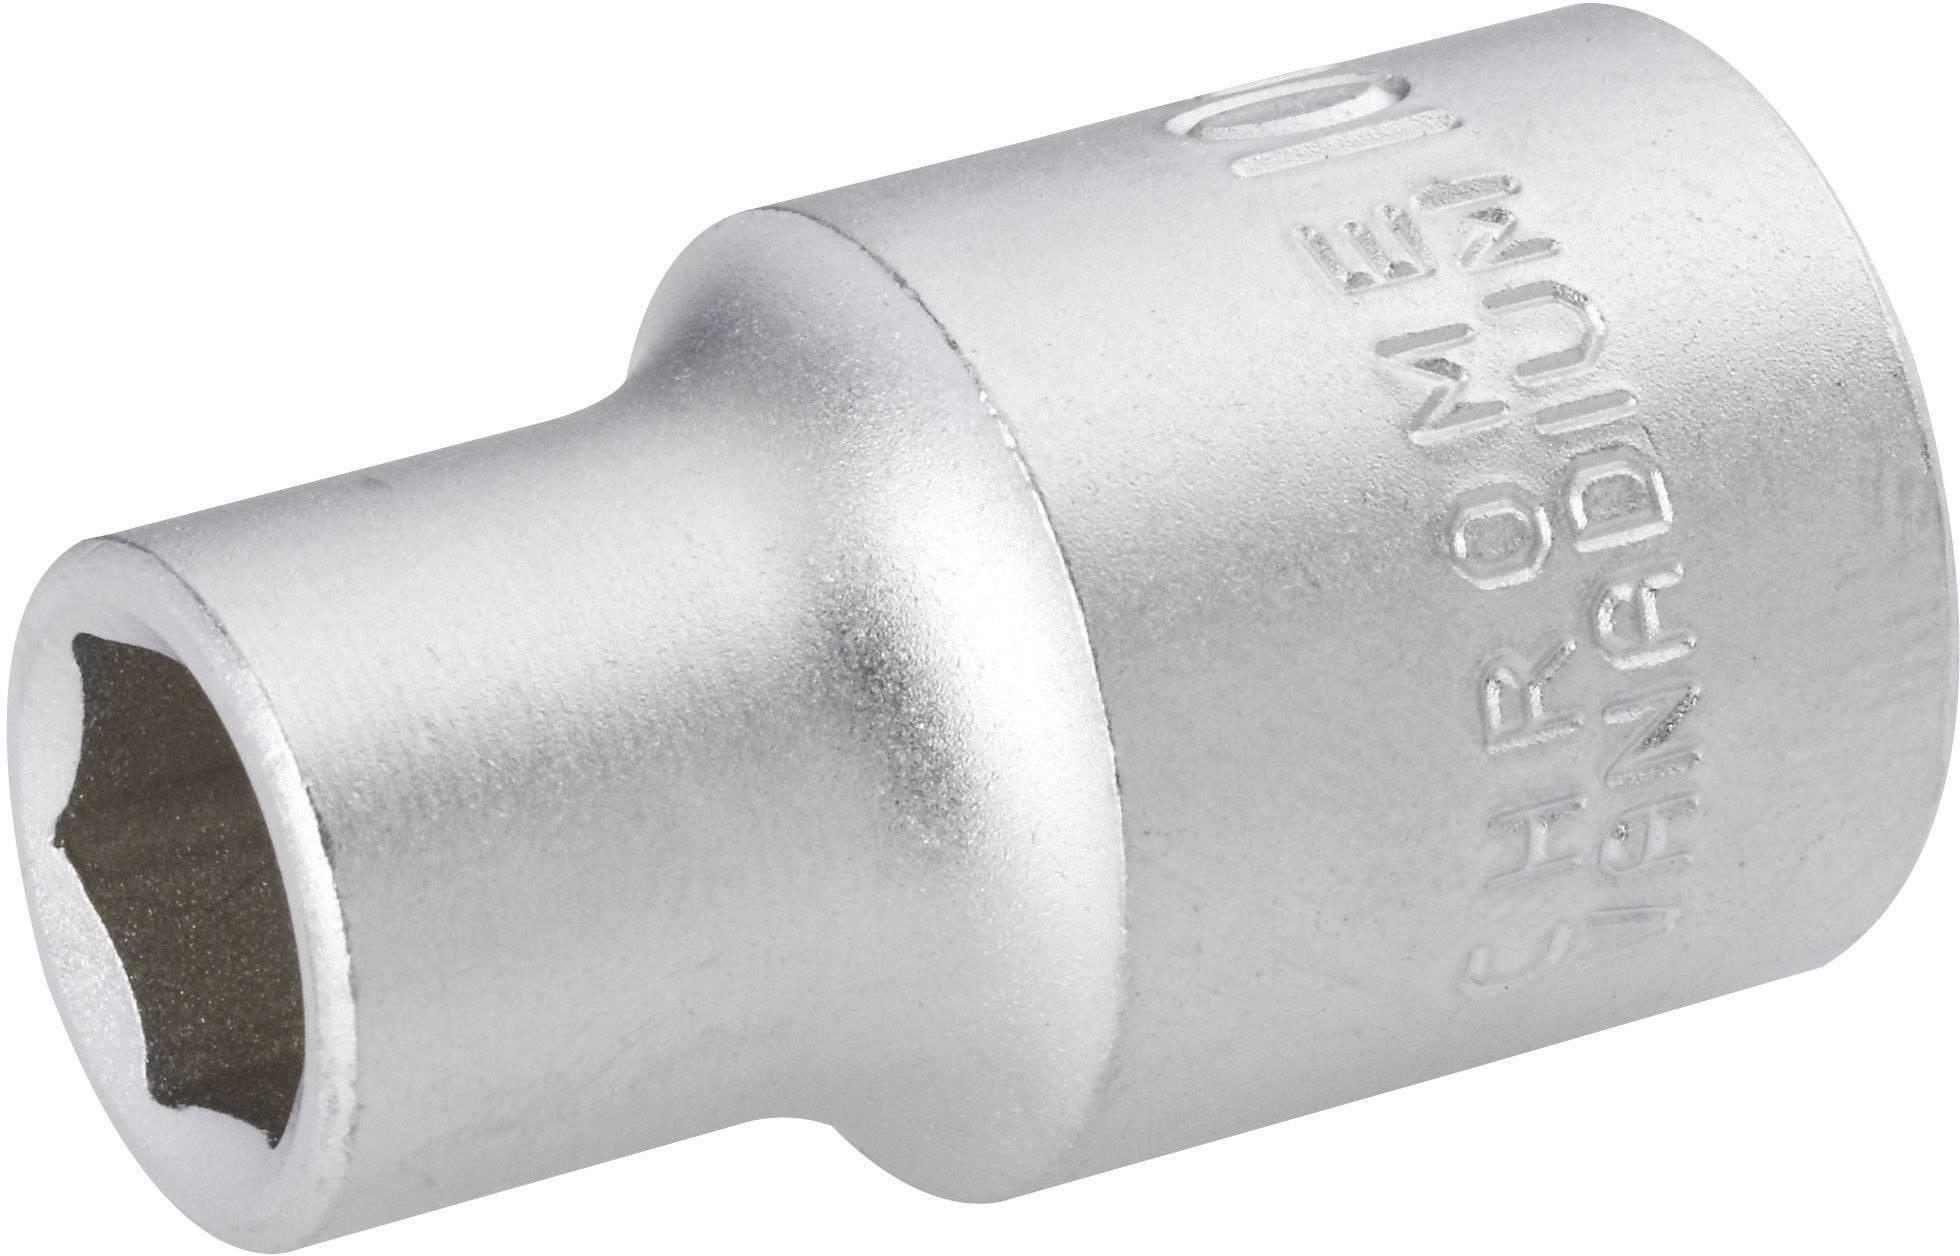 "Nadstavec na račňu TOOLCRAFT 820767, 1/2"" (12.5 mm), 14 mm"